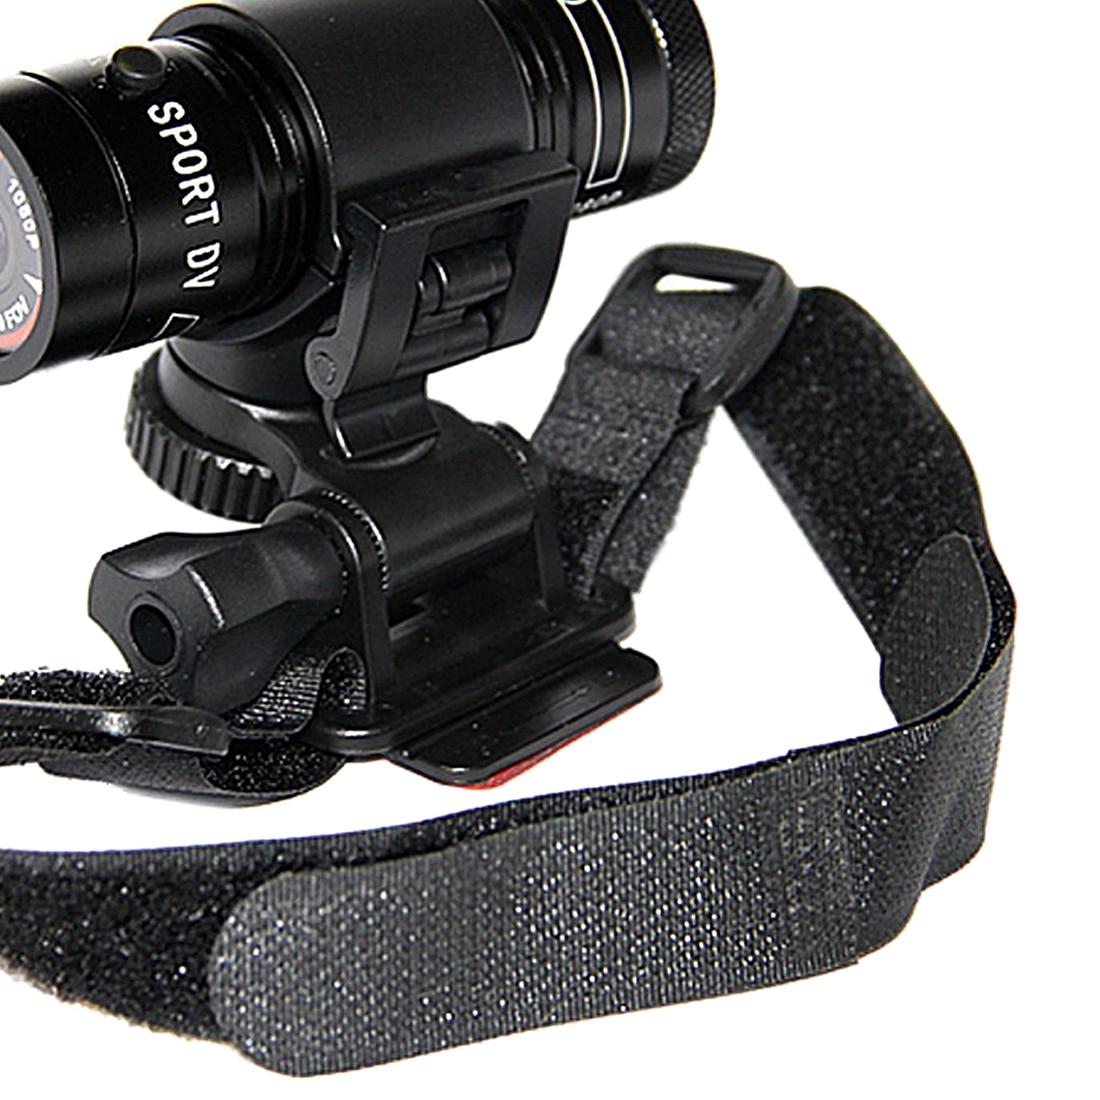 5 Packs Sport Camera Full HD 1080P Action Waterproof Video Recorder Helmet Bike DVR other full hd 1080p sj1000 30 dvr bike surfing outdoor